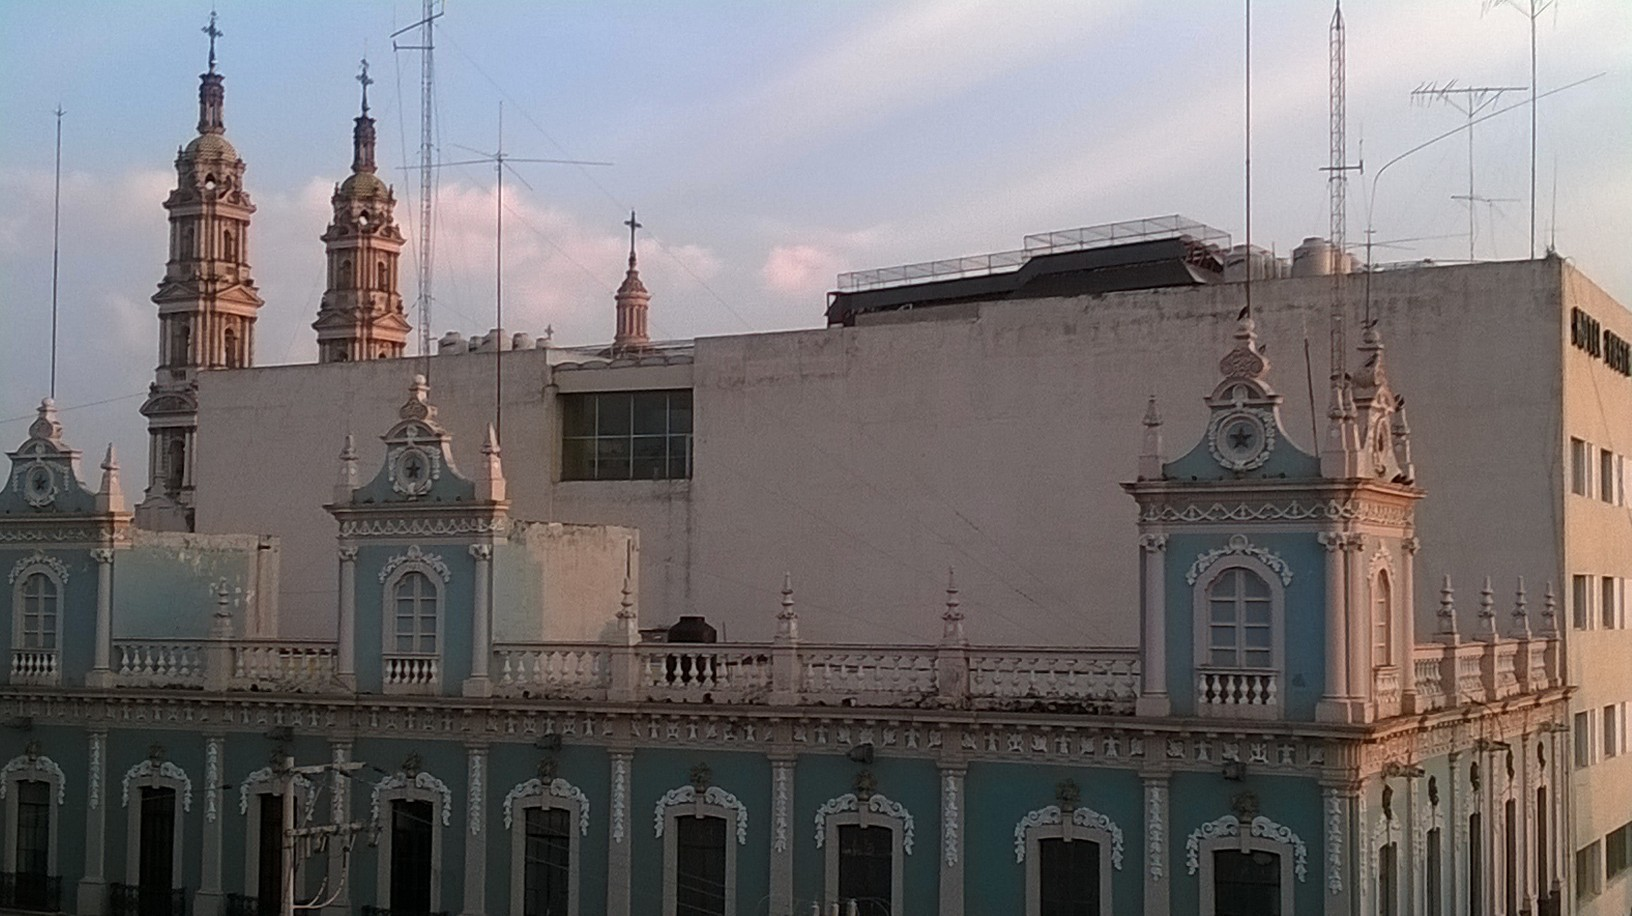 tepatitlan de morelos view front from hotel apr15